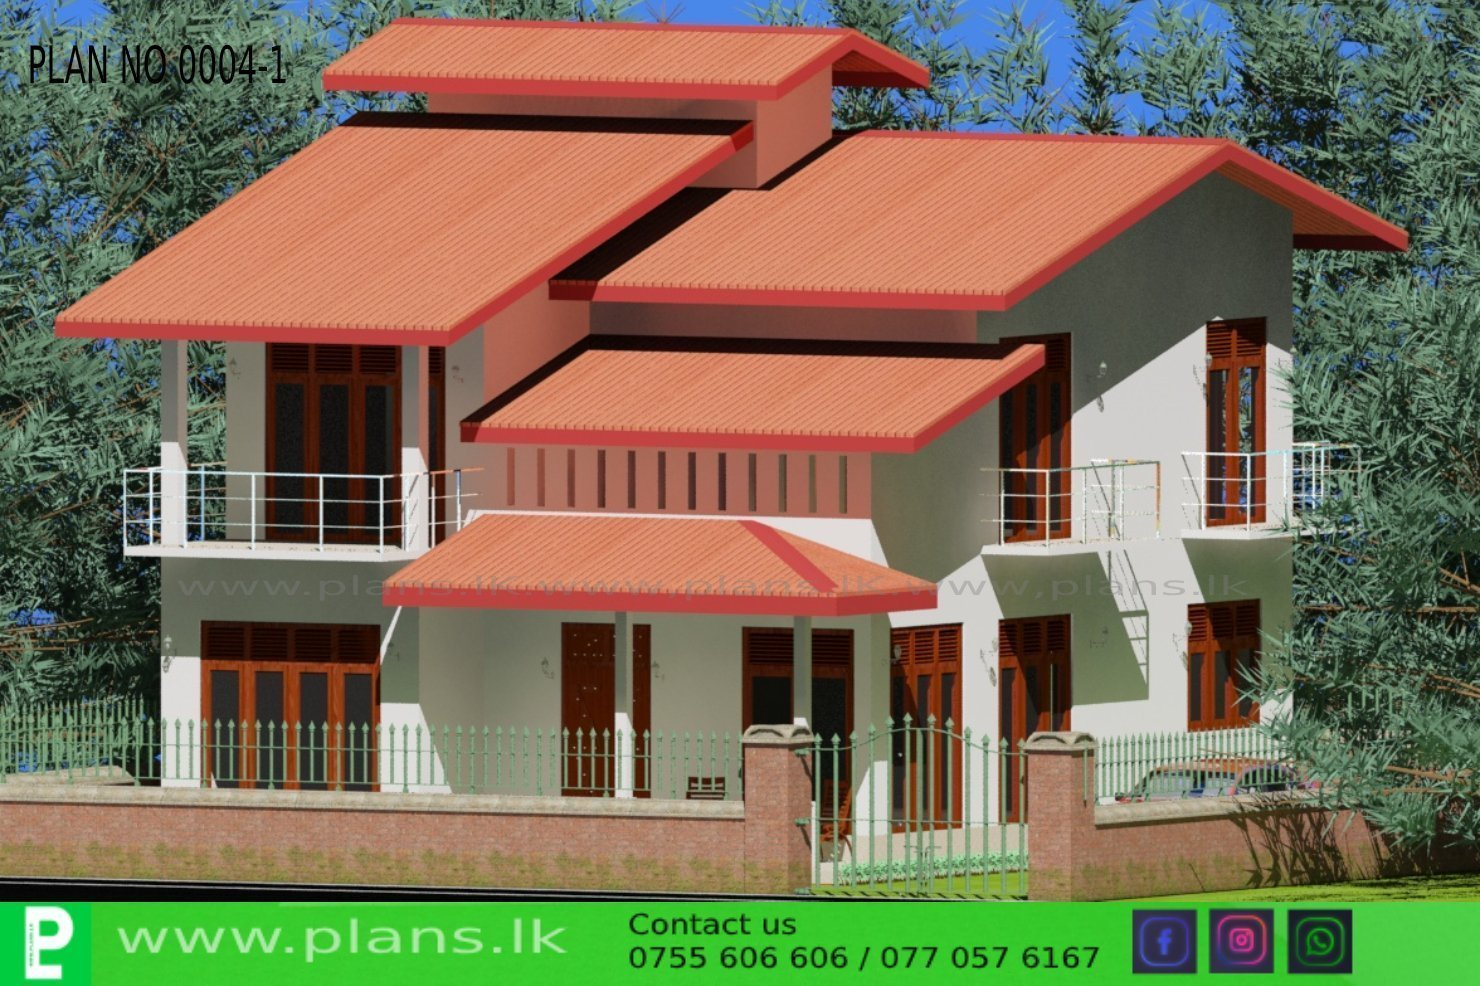 PLAN-0004-1 | Plans.lk - Home Plans Sri Lanka